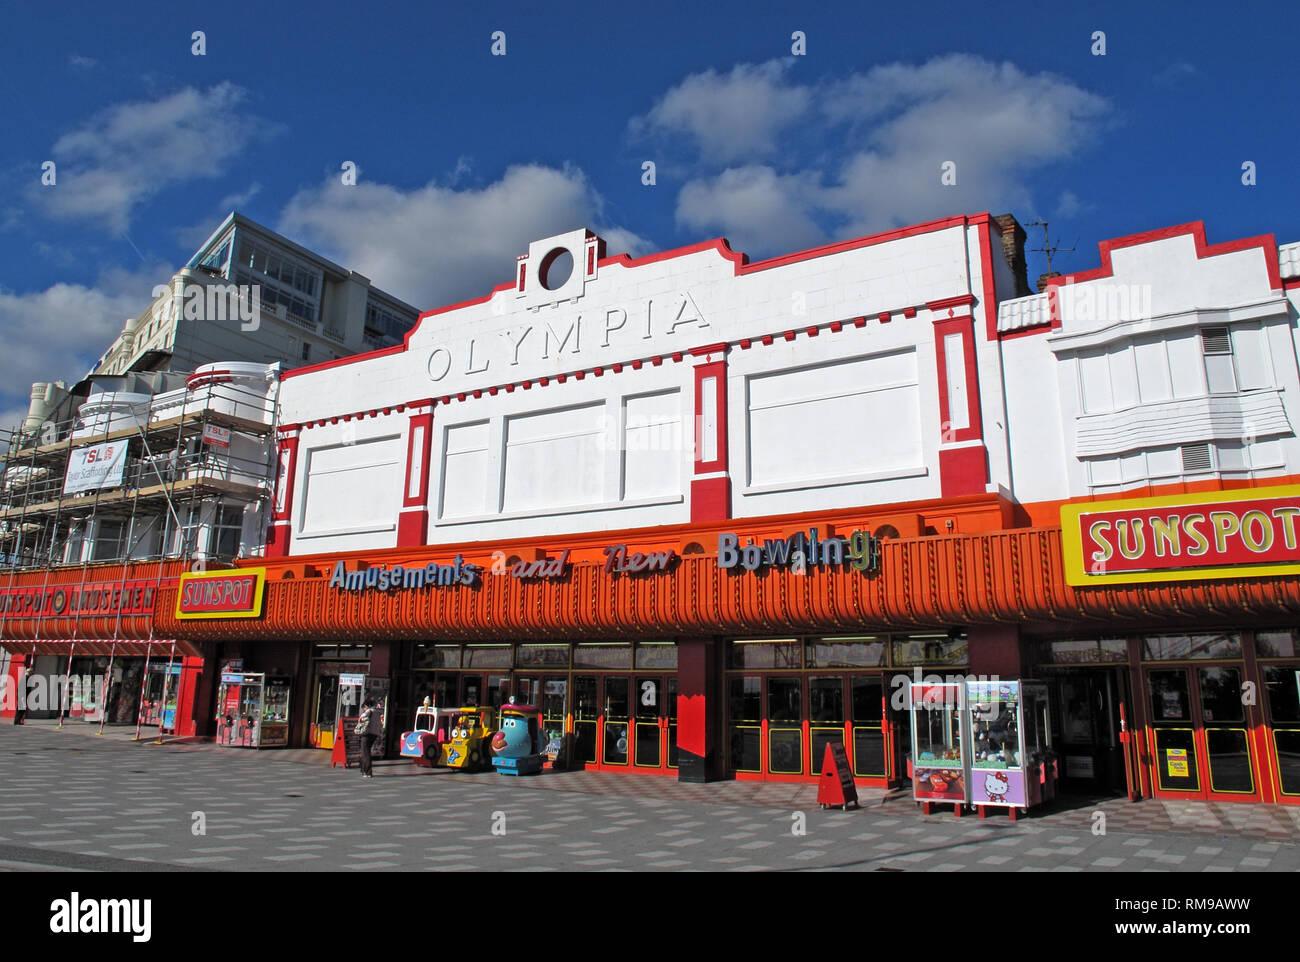 GoTonySmith,HotpixUK,@HotpixUK,England,UK,GB,Seaside,town,Essex,South